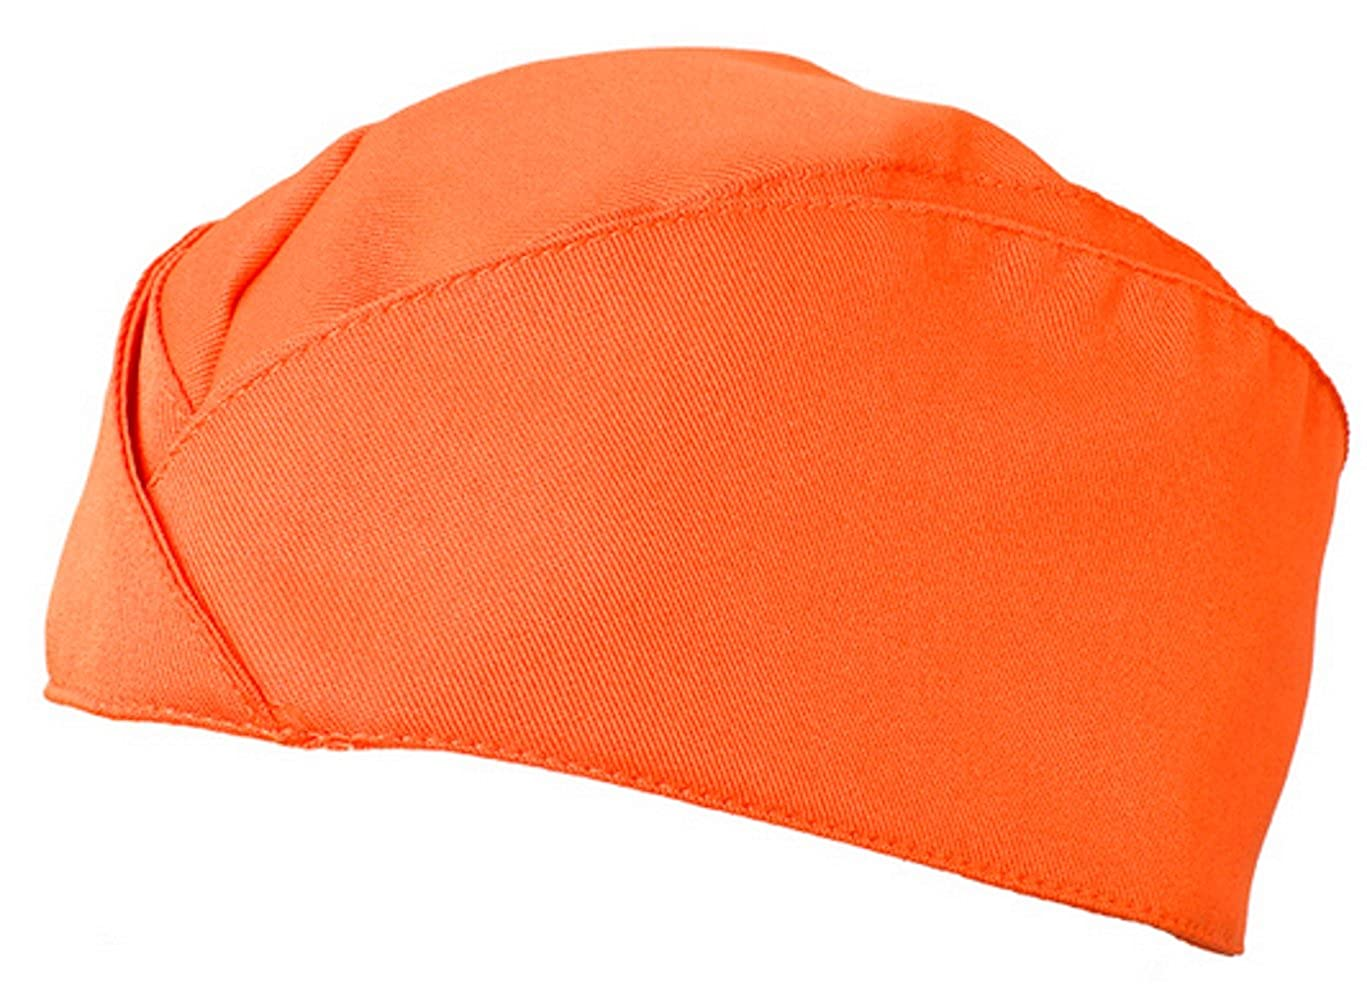 Bustina unisex arancione bar,gelateria,ristorante caffè MT0109